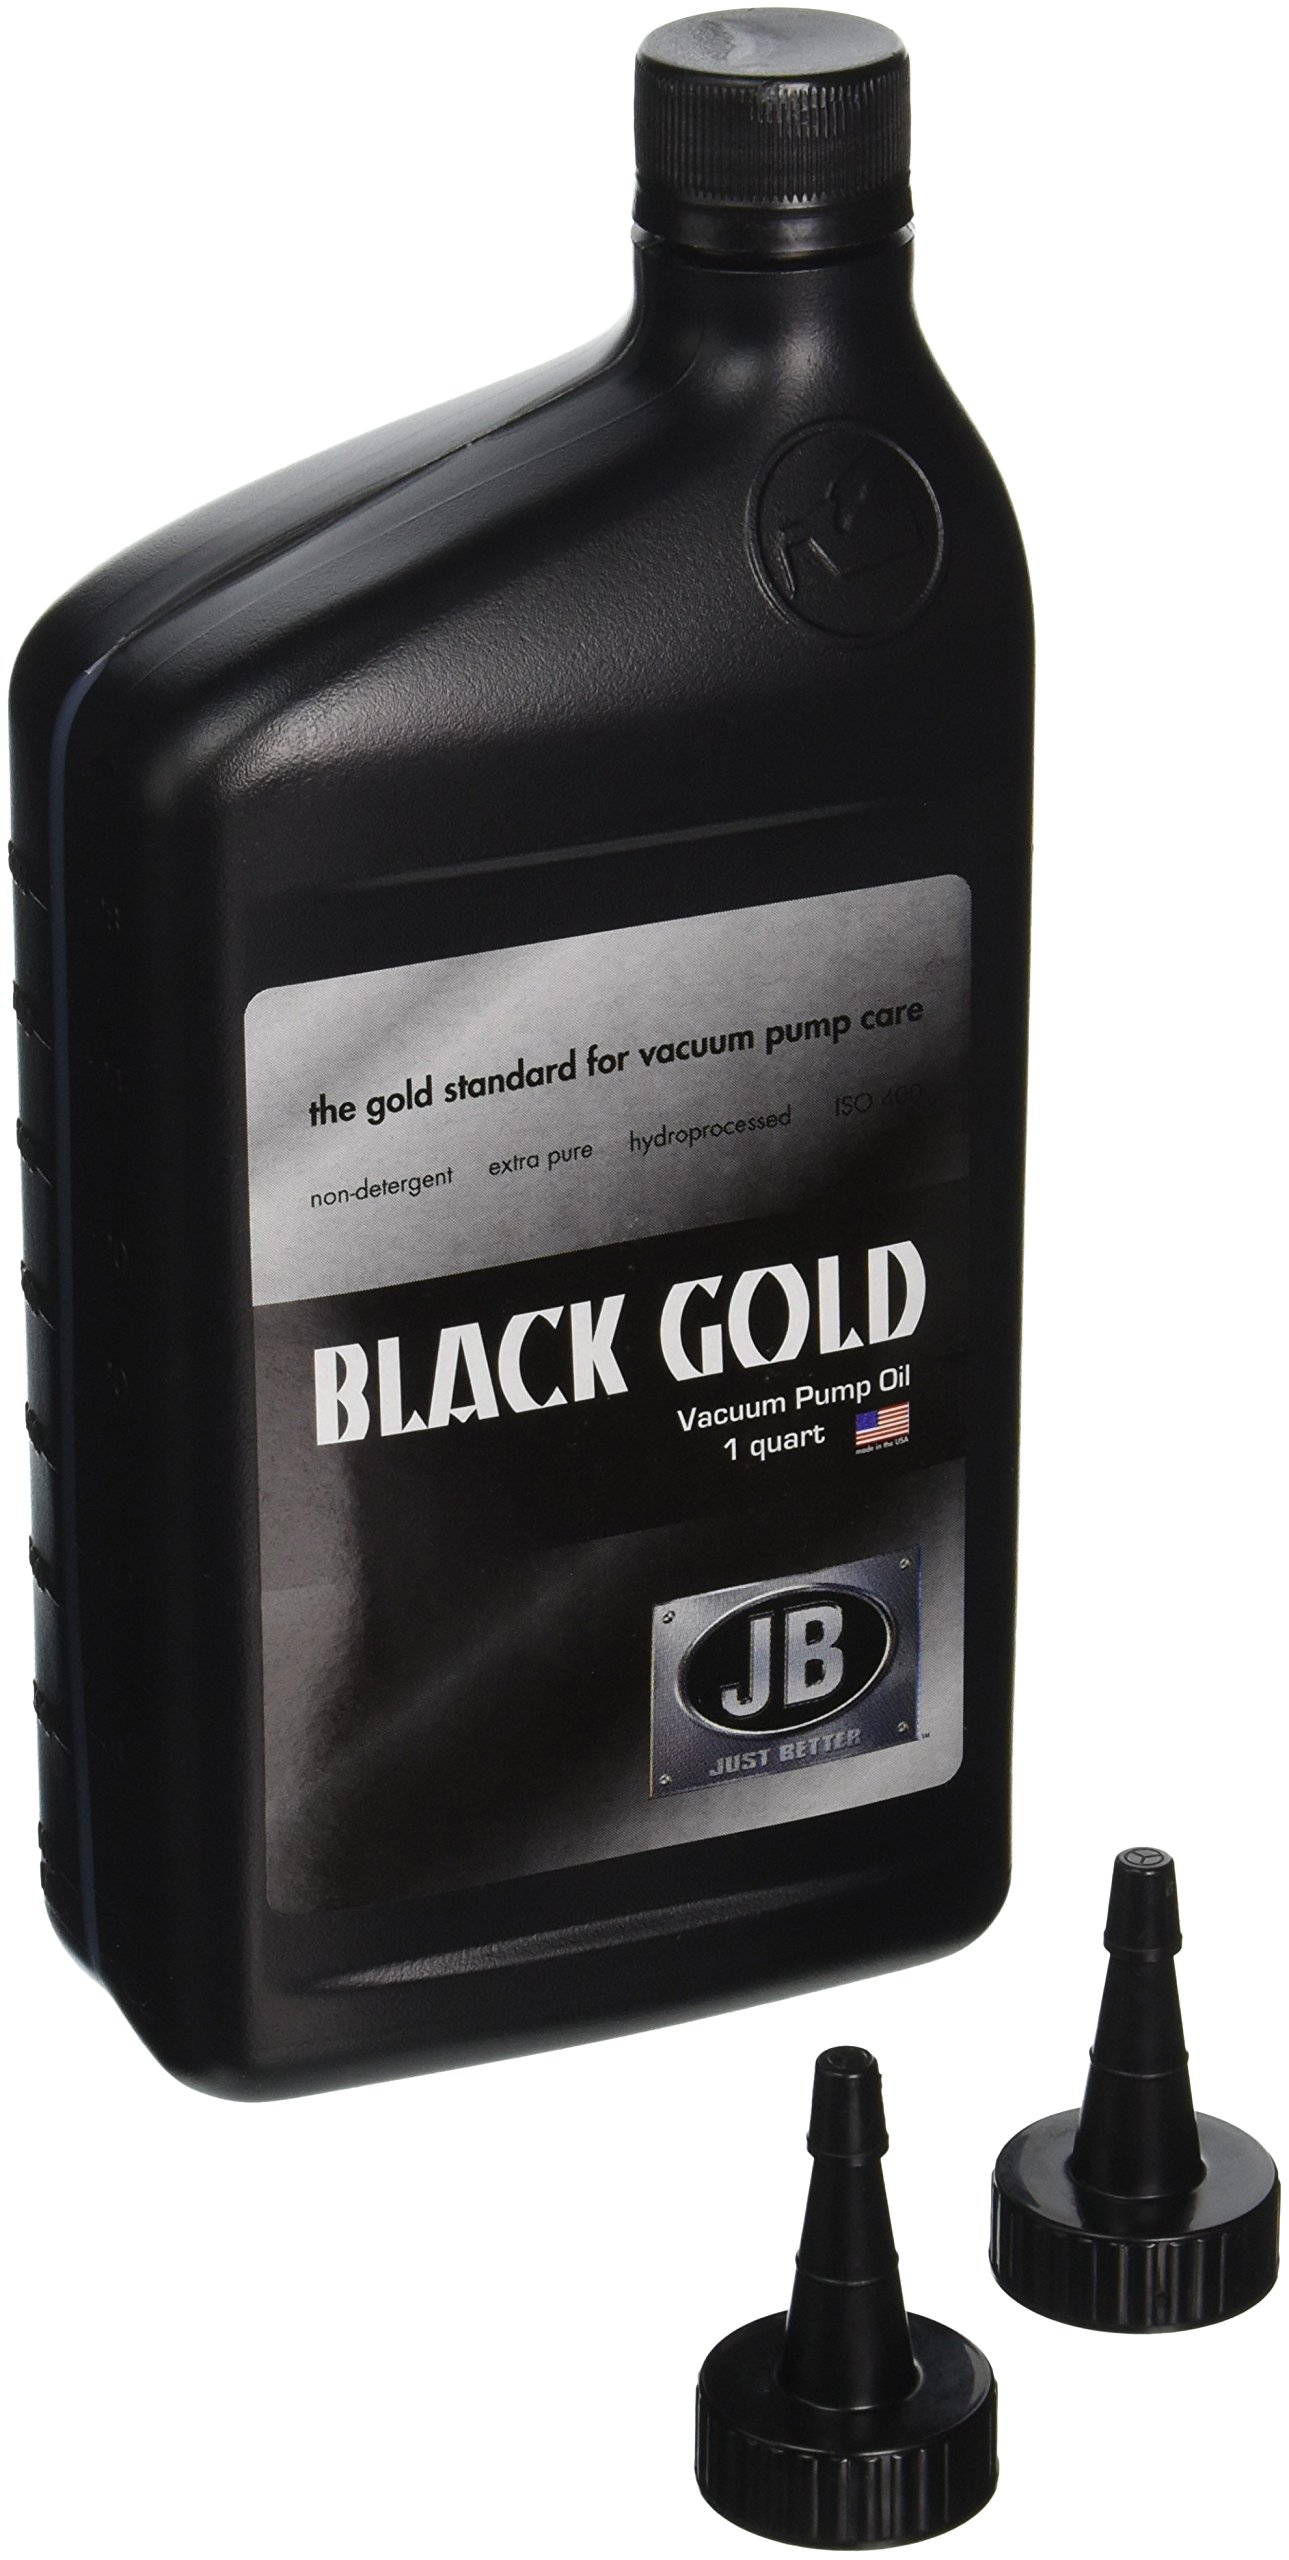 JB Industries Bottle of Black Gold Vacuum Pump Oil , 1 quart